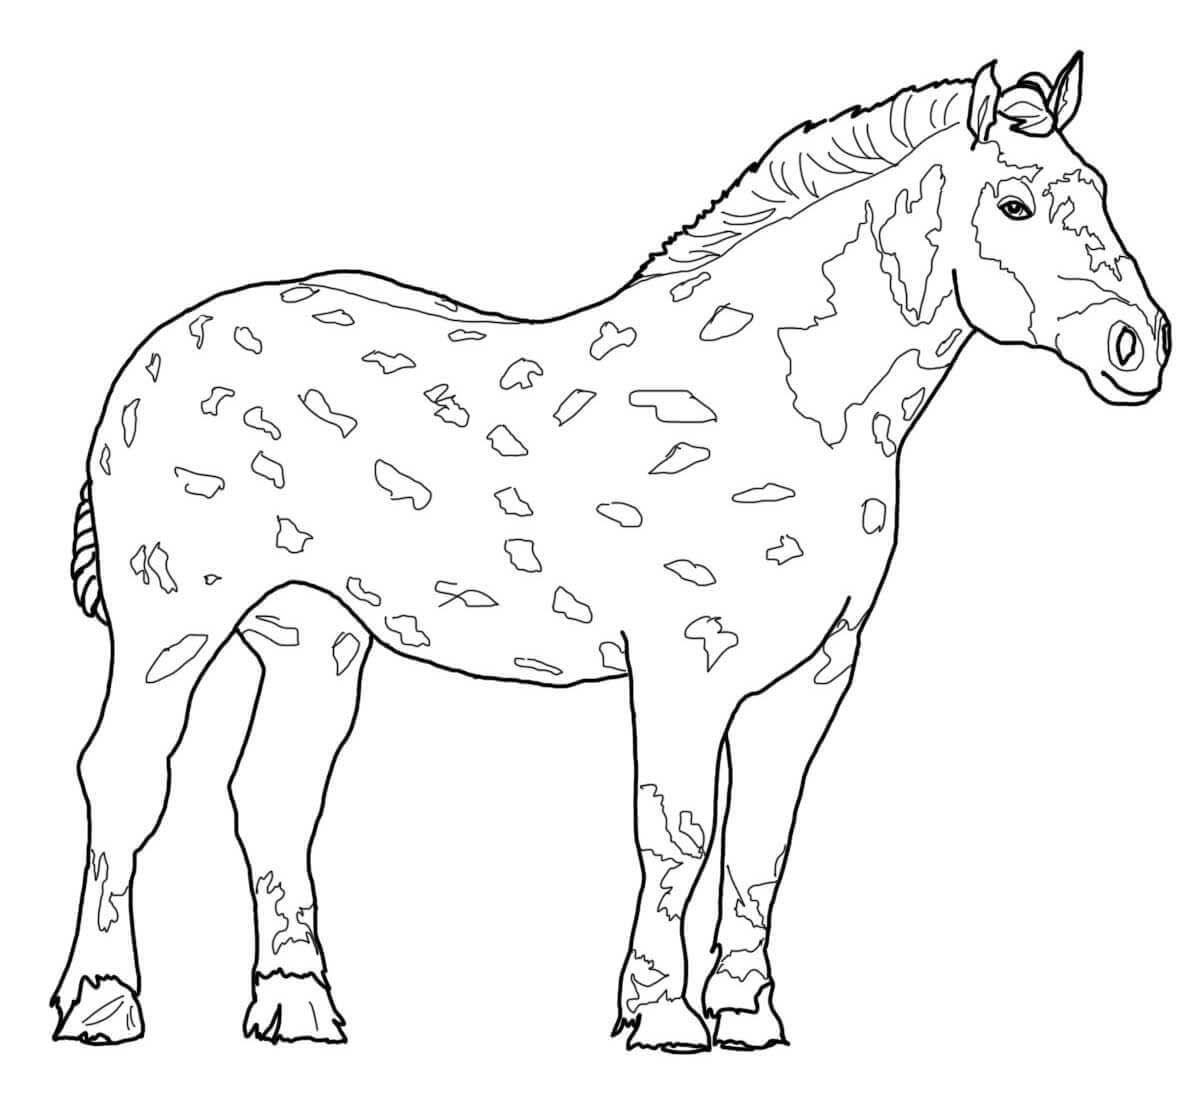 Percheron Horse Coloring Page Horse Coloring Bird Coloring Pages Horse Coloring Pages [ 1100 x 1200 Pixel ]